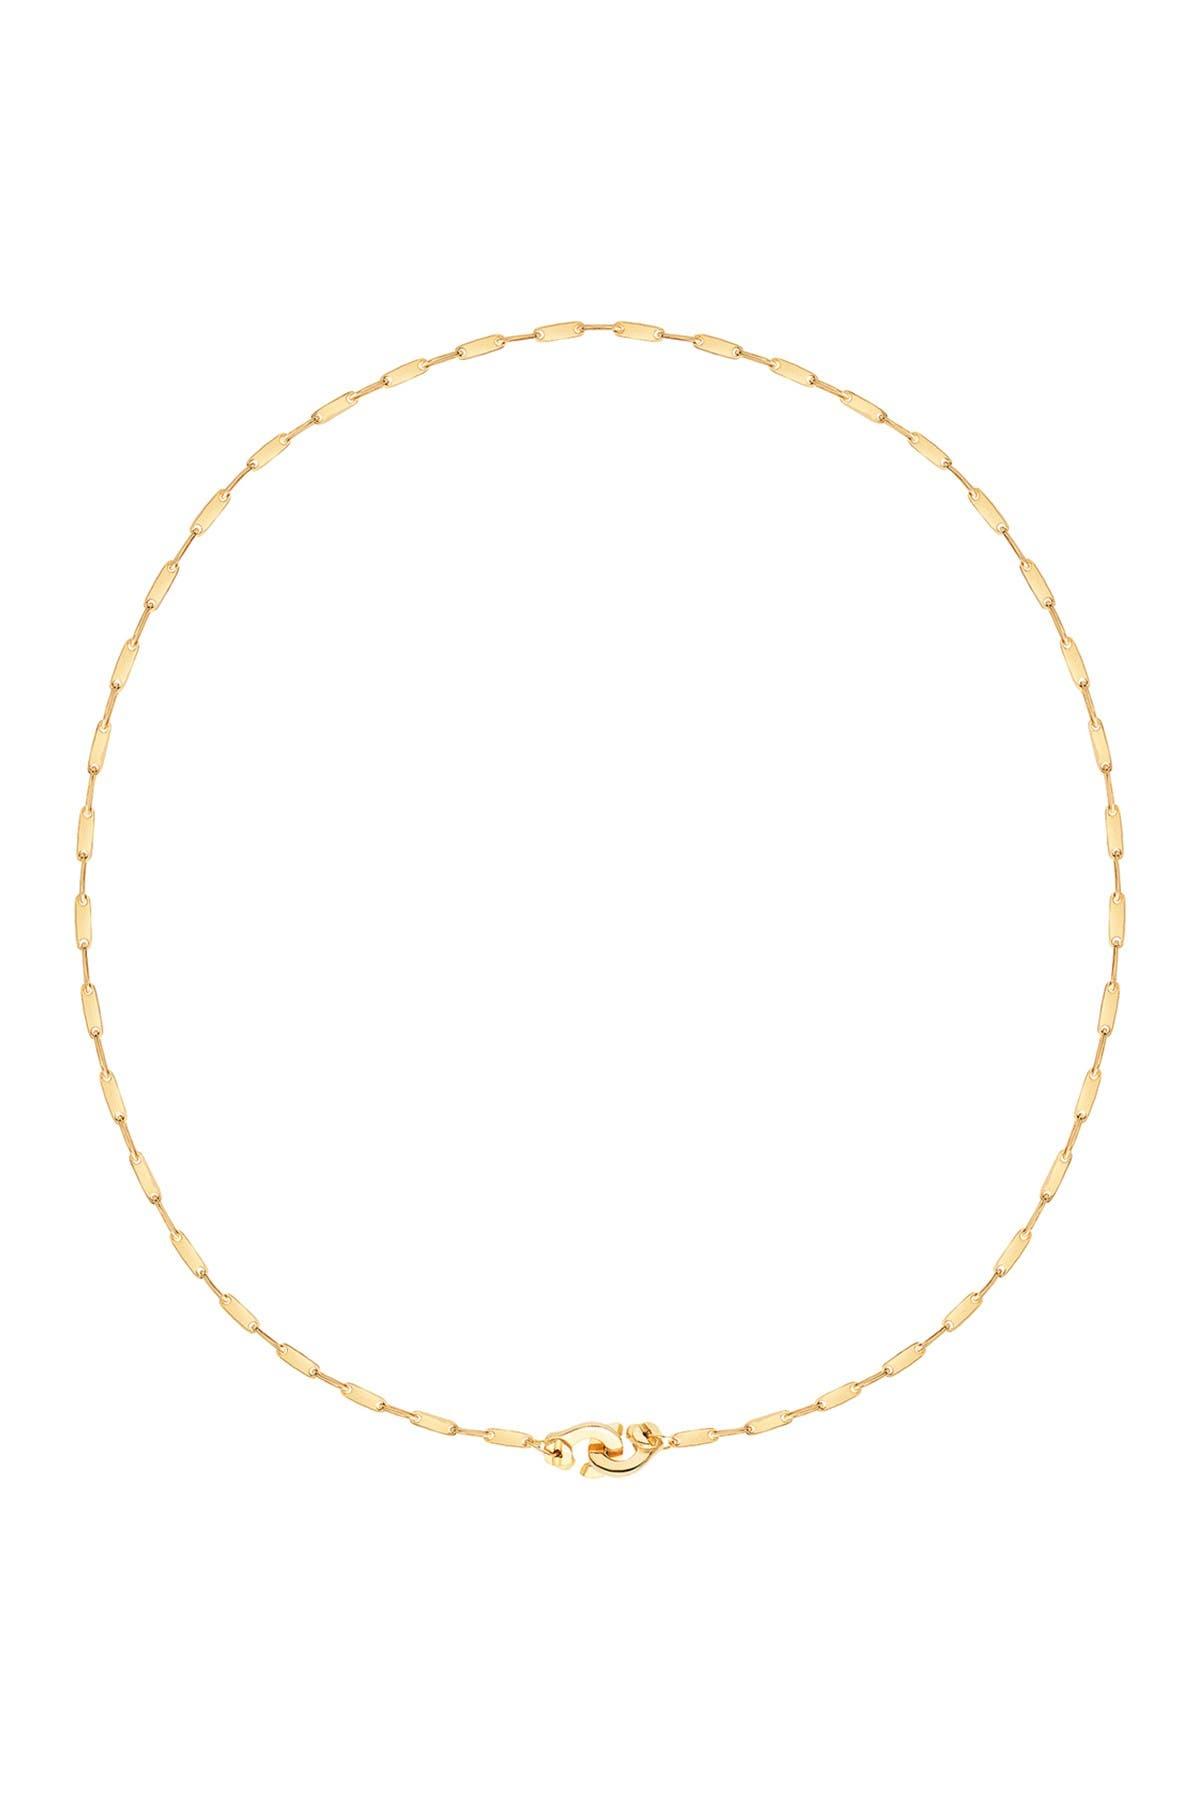 Image of Gabi Rielle 14K Yellow Gold Vermeil Handcuff Chain Choker Necklace